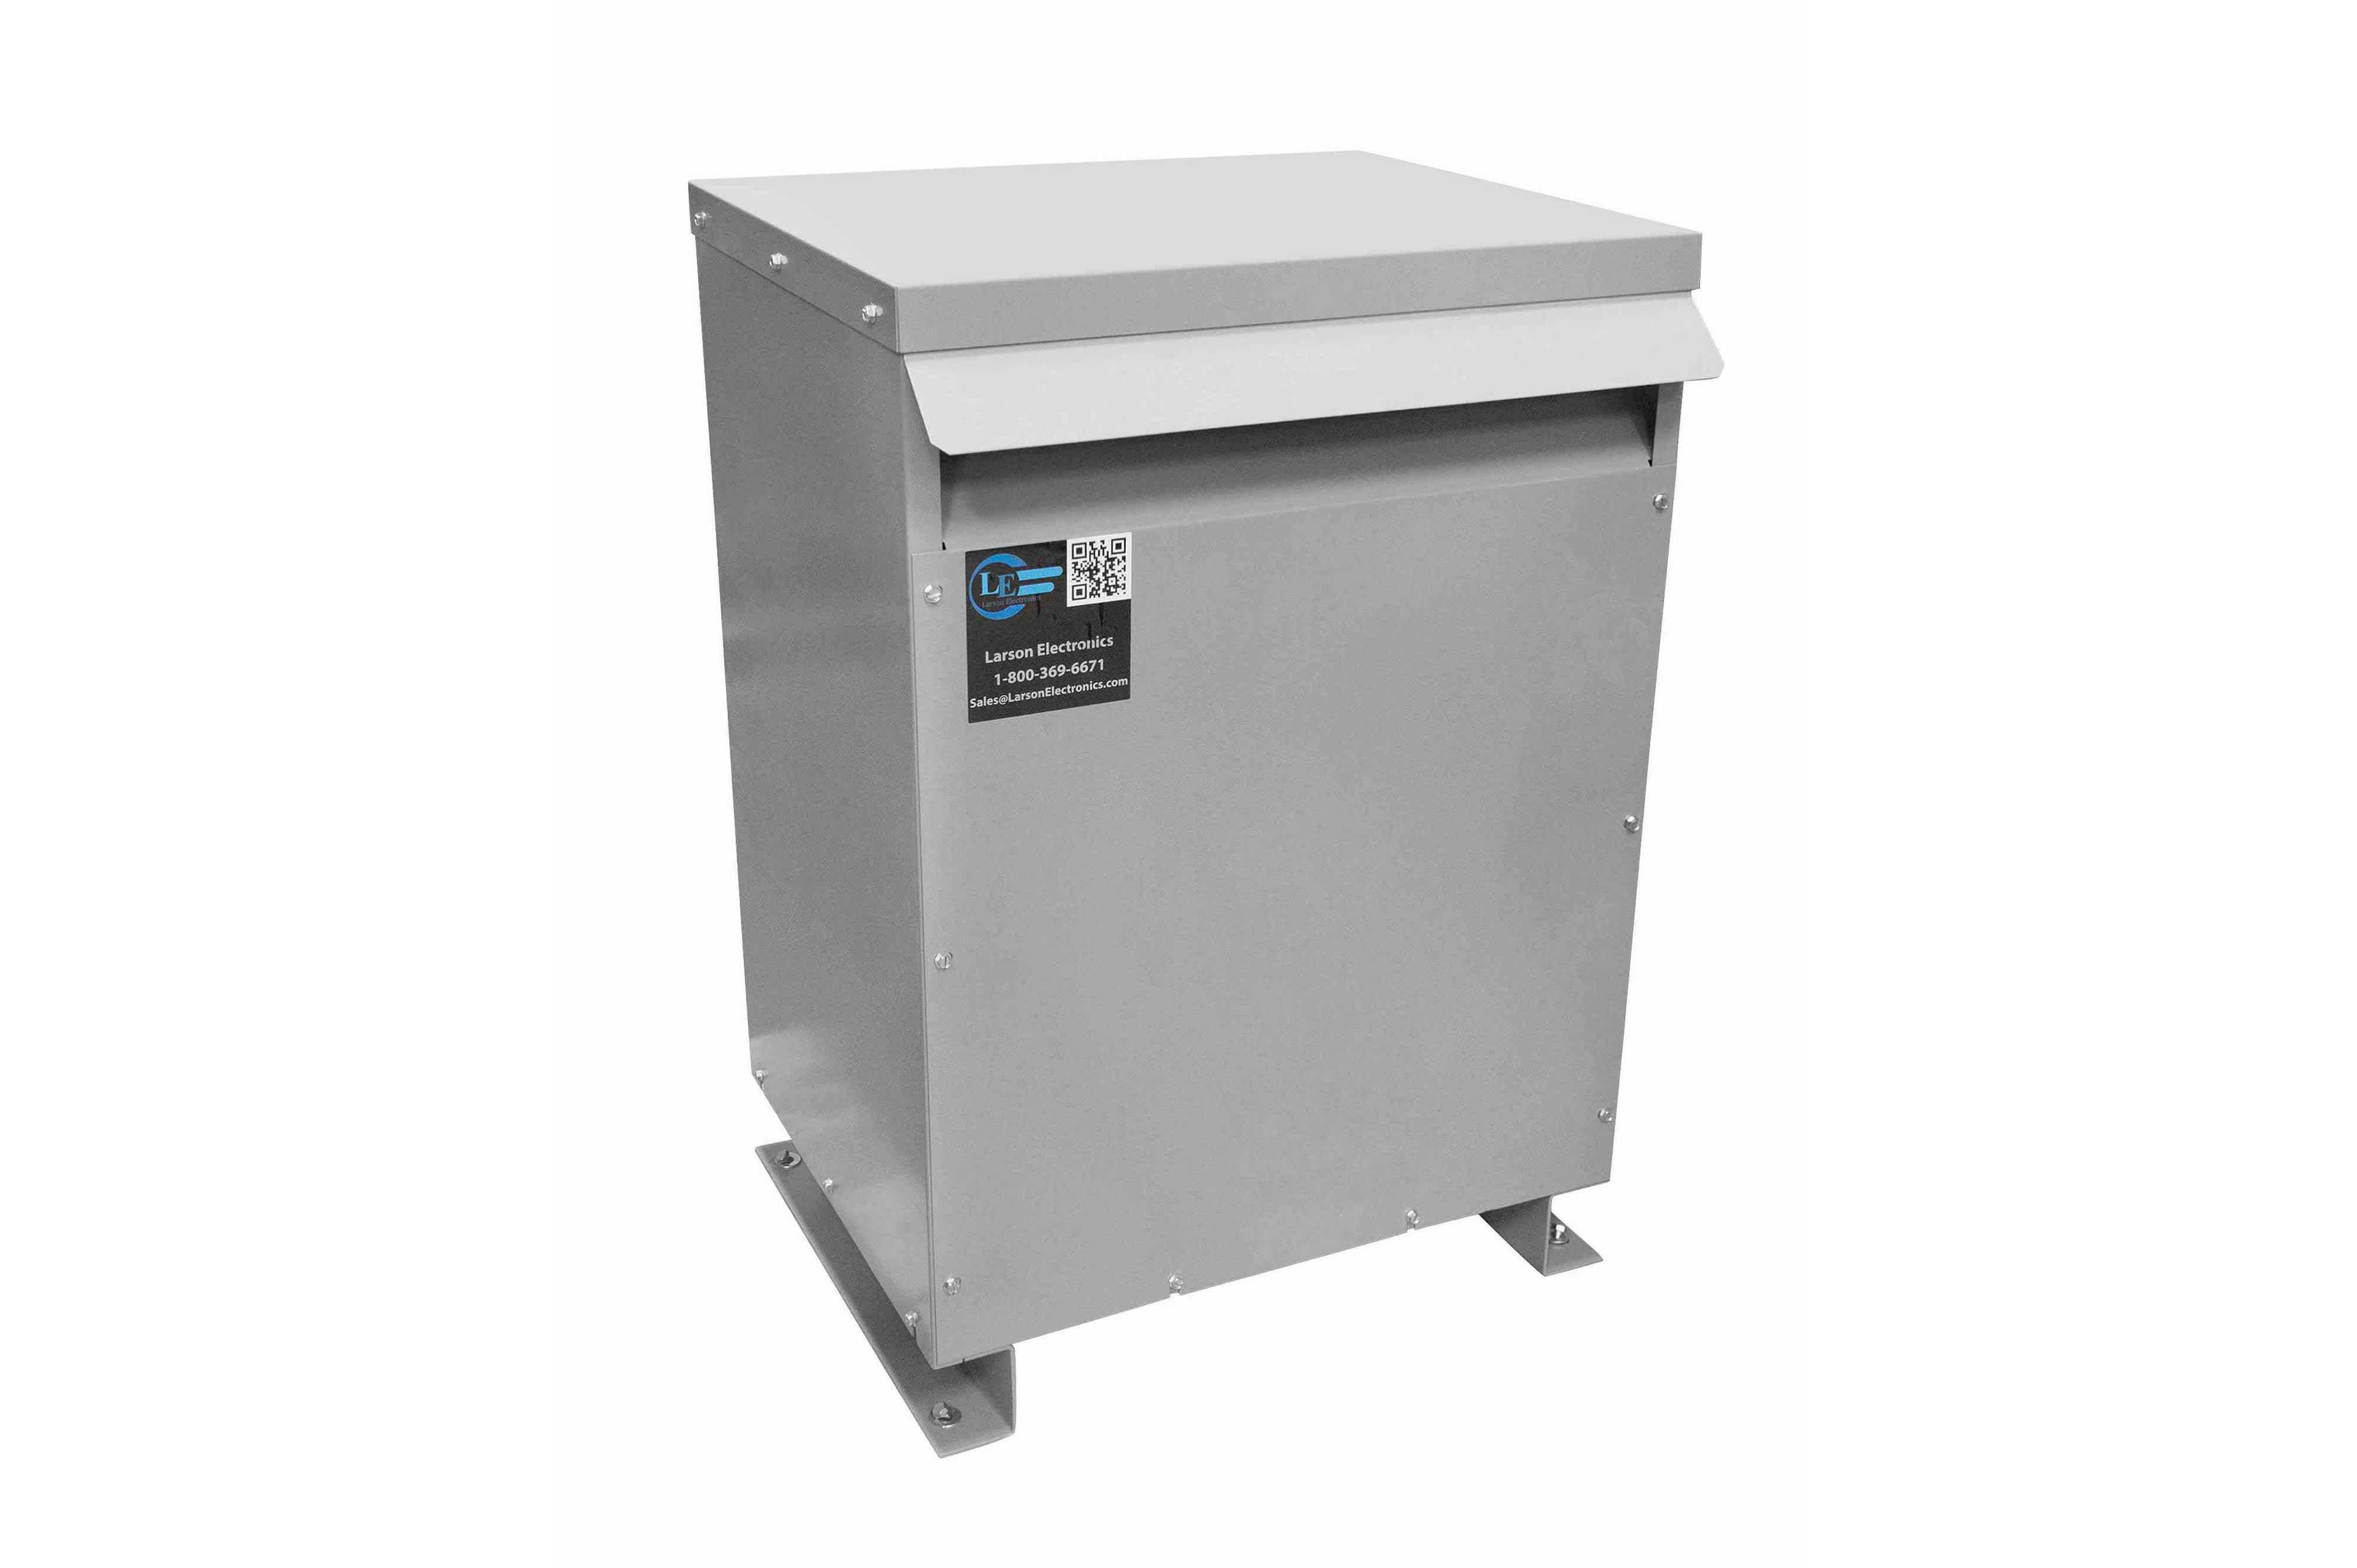 100 kVA 3PH Isolation Transformer, 575V Wye Primary, 380V Delta Secondary, N3R, Ventilated, 60 Hz